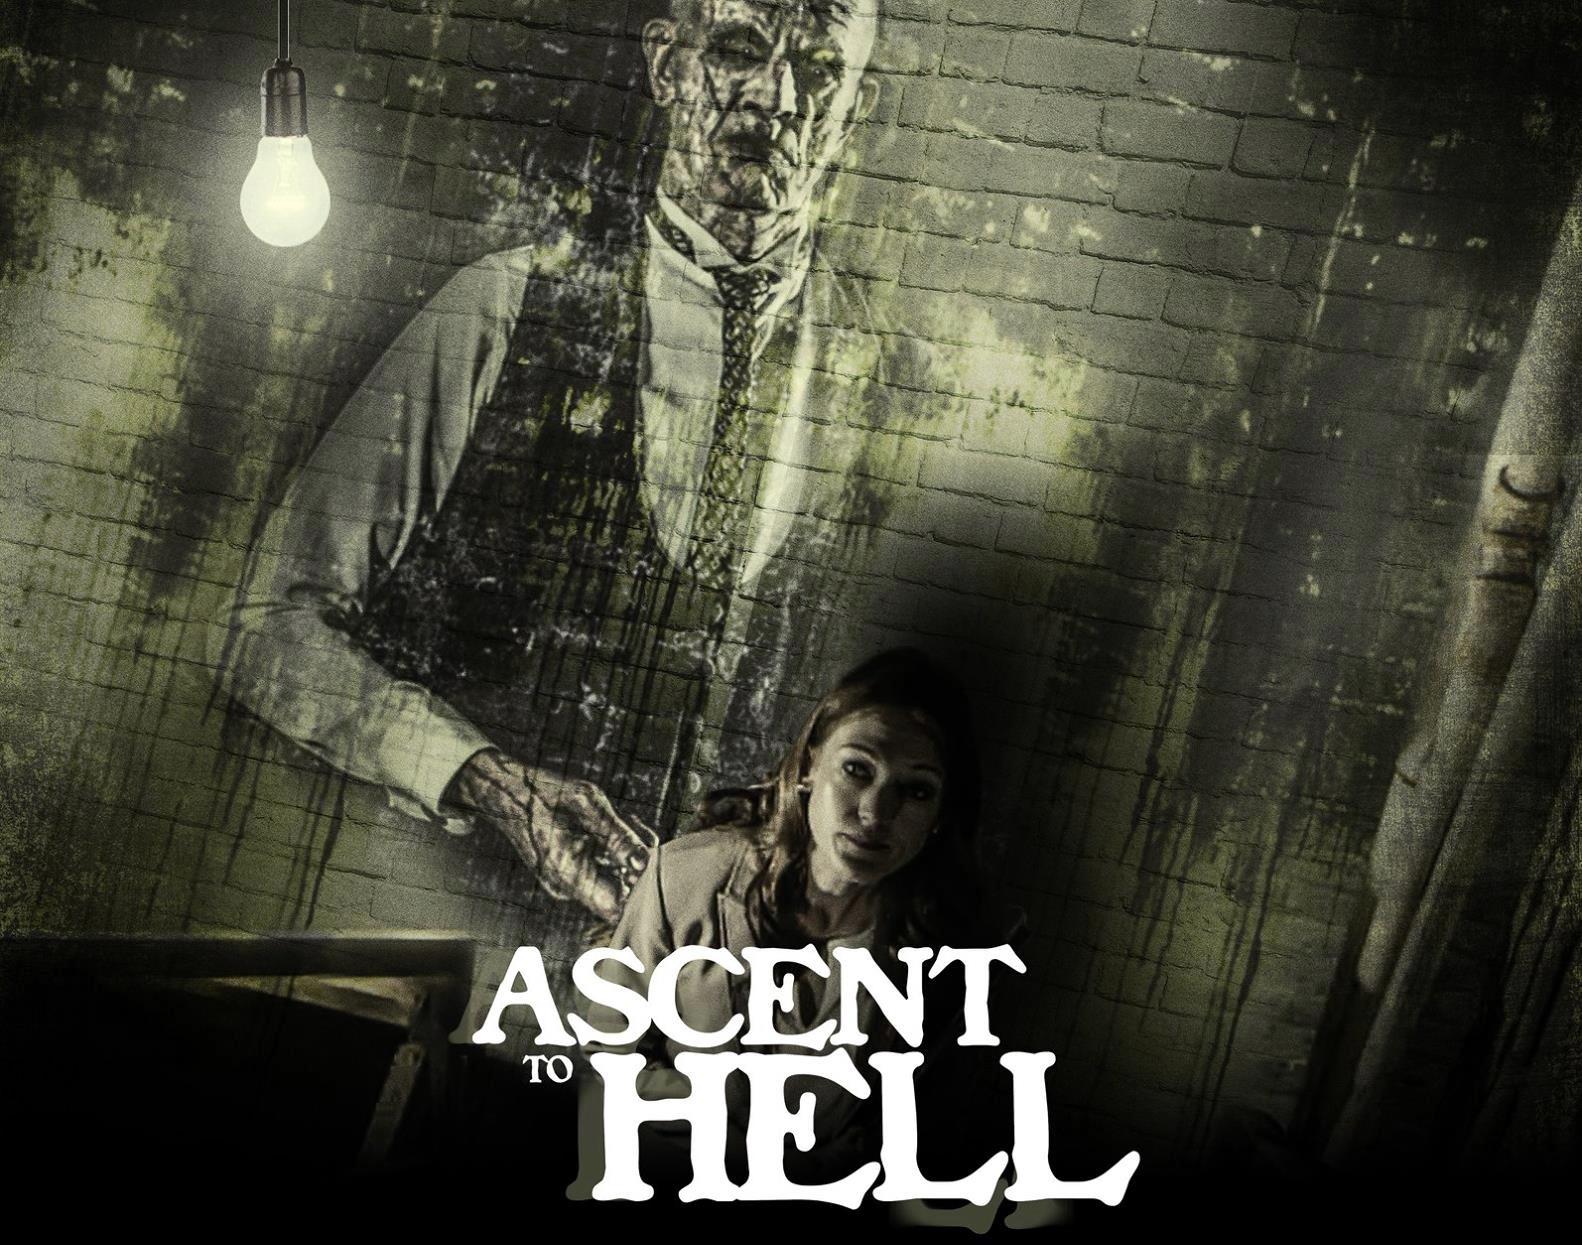 Ascent To Hell Filem Bajet Rendah Yang Penuh Elemen Seram